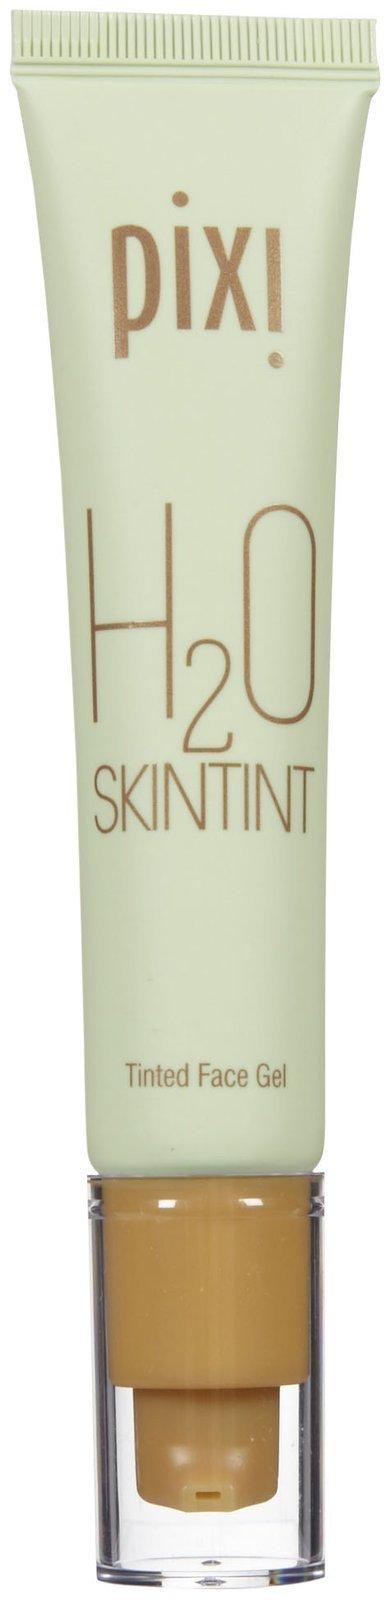 Pixi H2O Skintint - 2 Nude - 1.18 oz